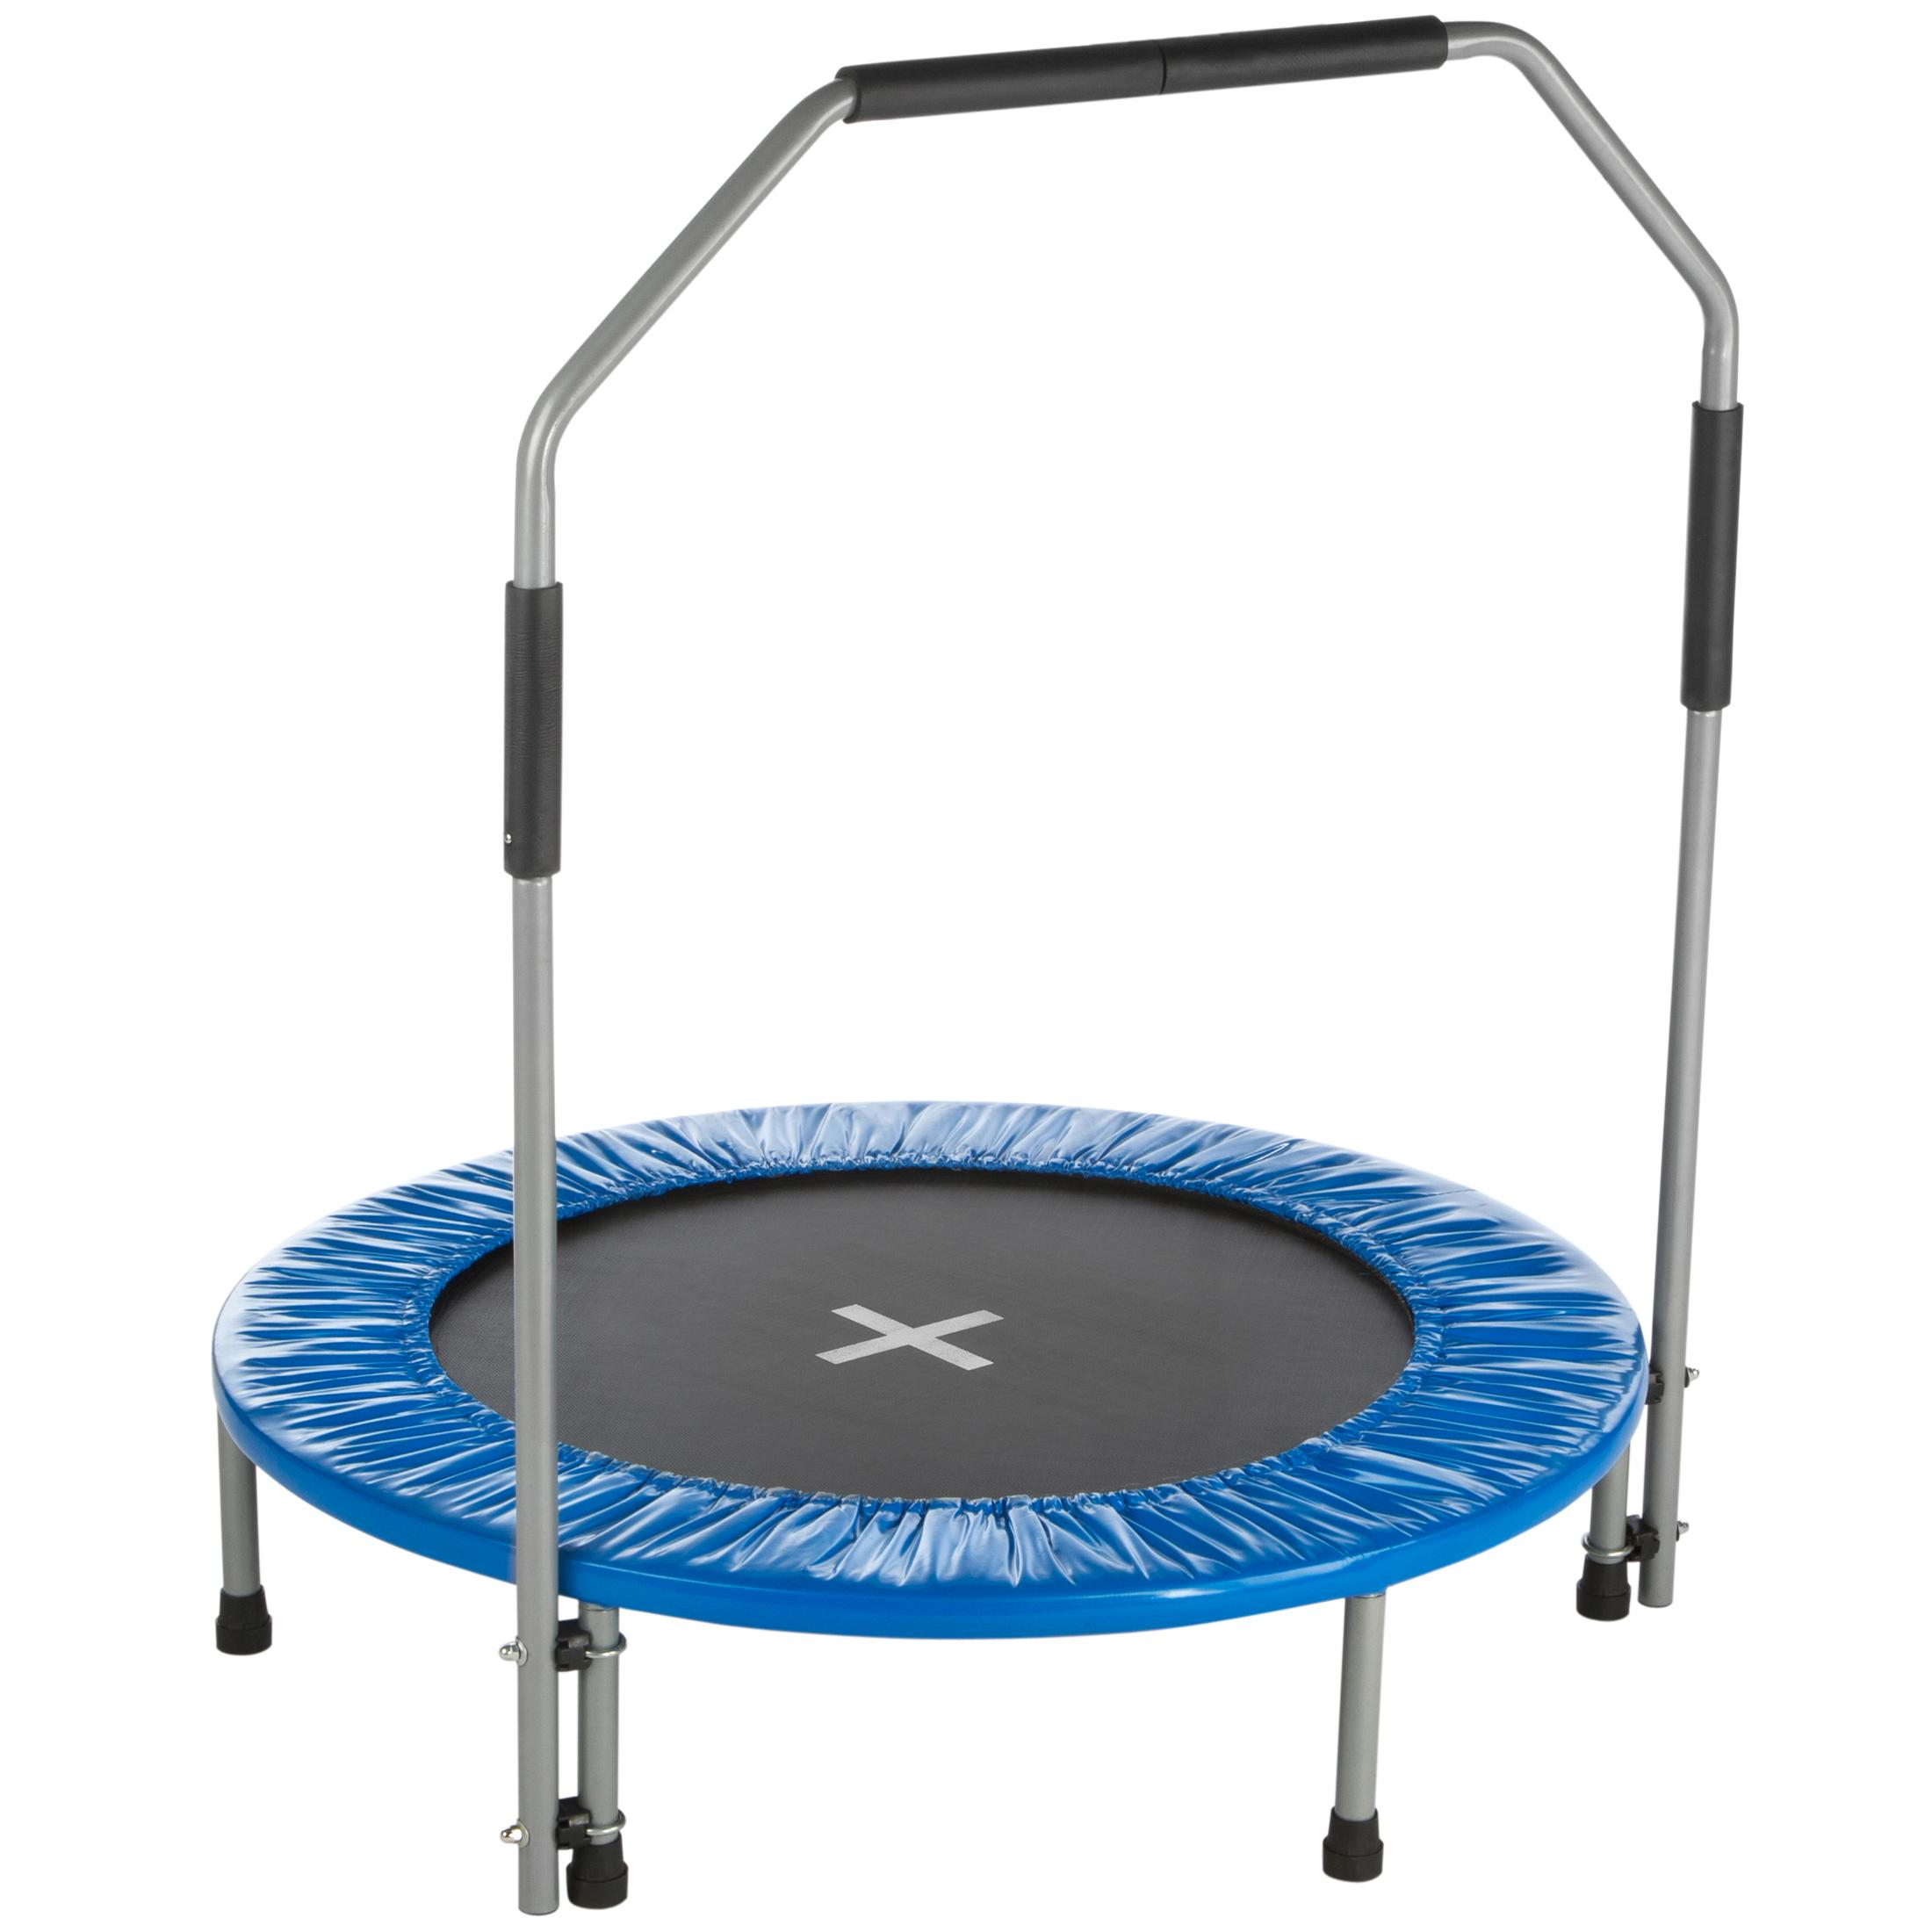 Ultrasport Jumper - Cama elástica de Fitness con agarradera, 96 cm ...